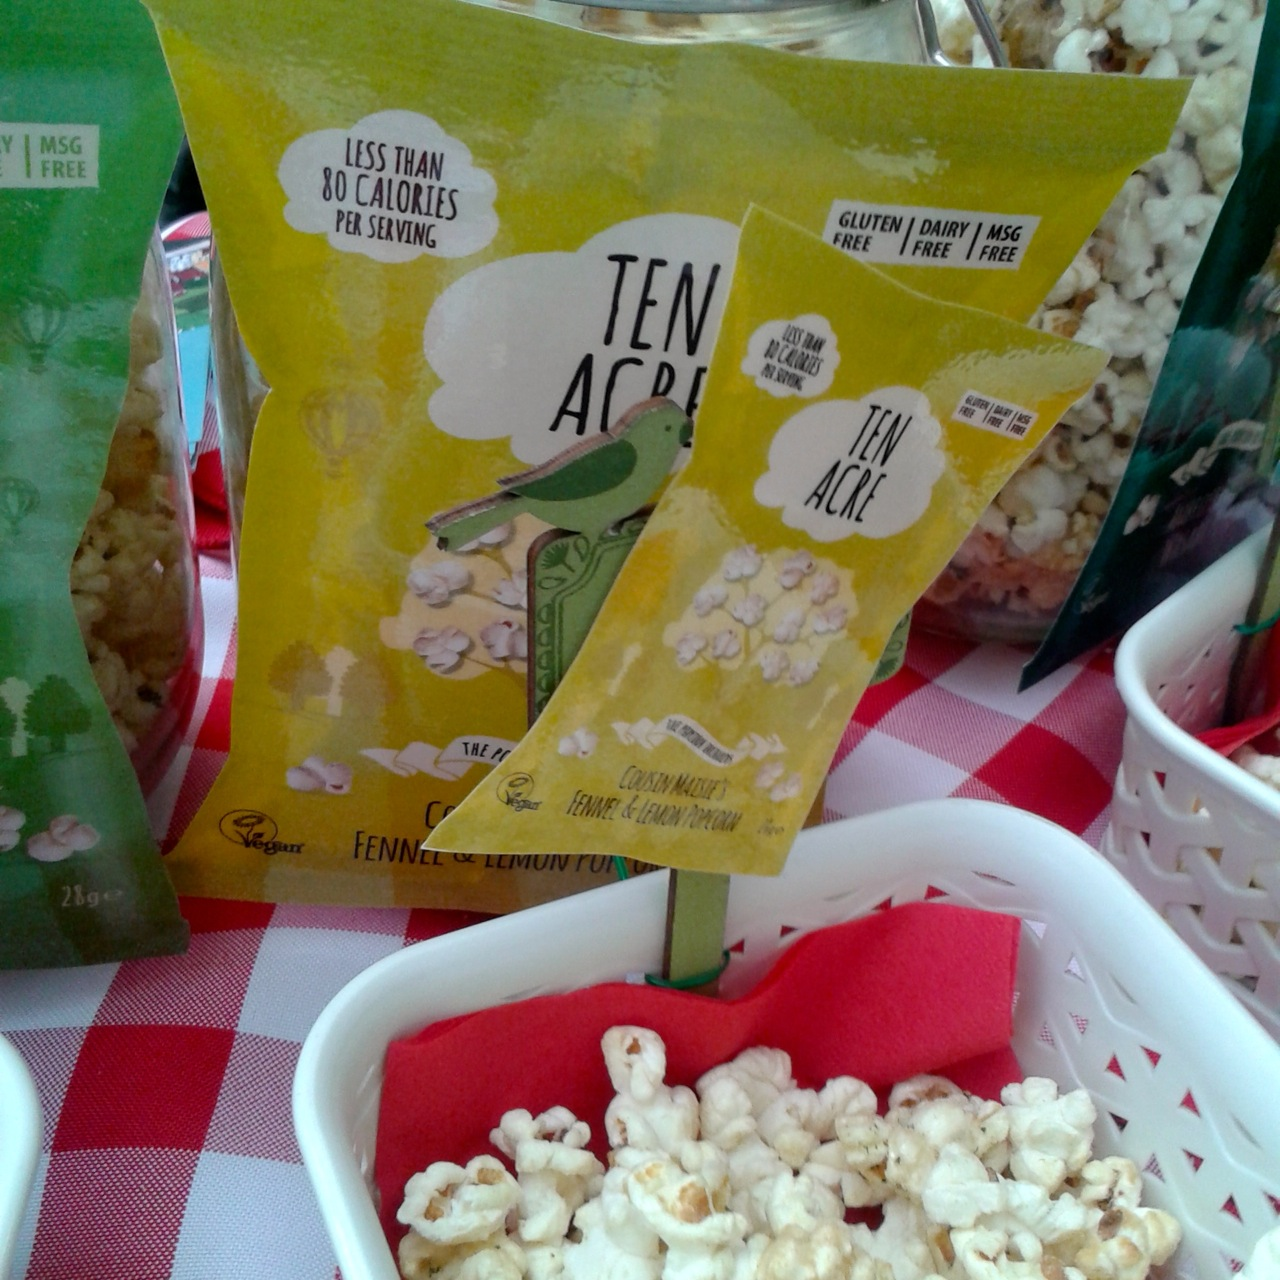 http://fatgayvegan.com/wp-content/uploads/2014/09/ten-acres-popcorn.jpg